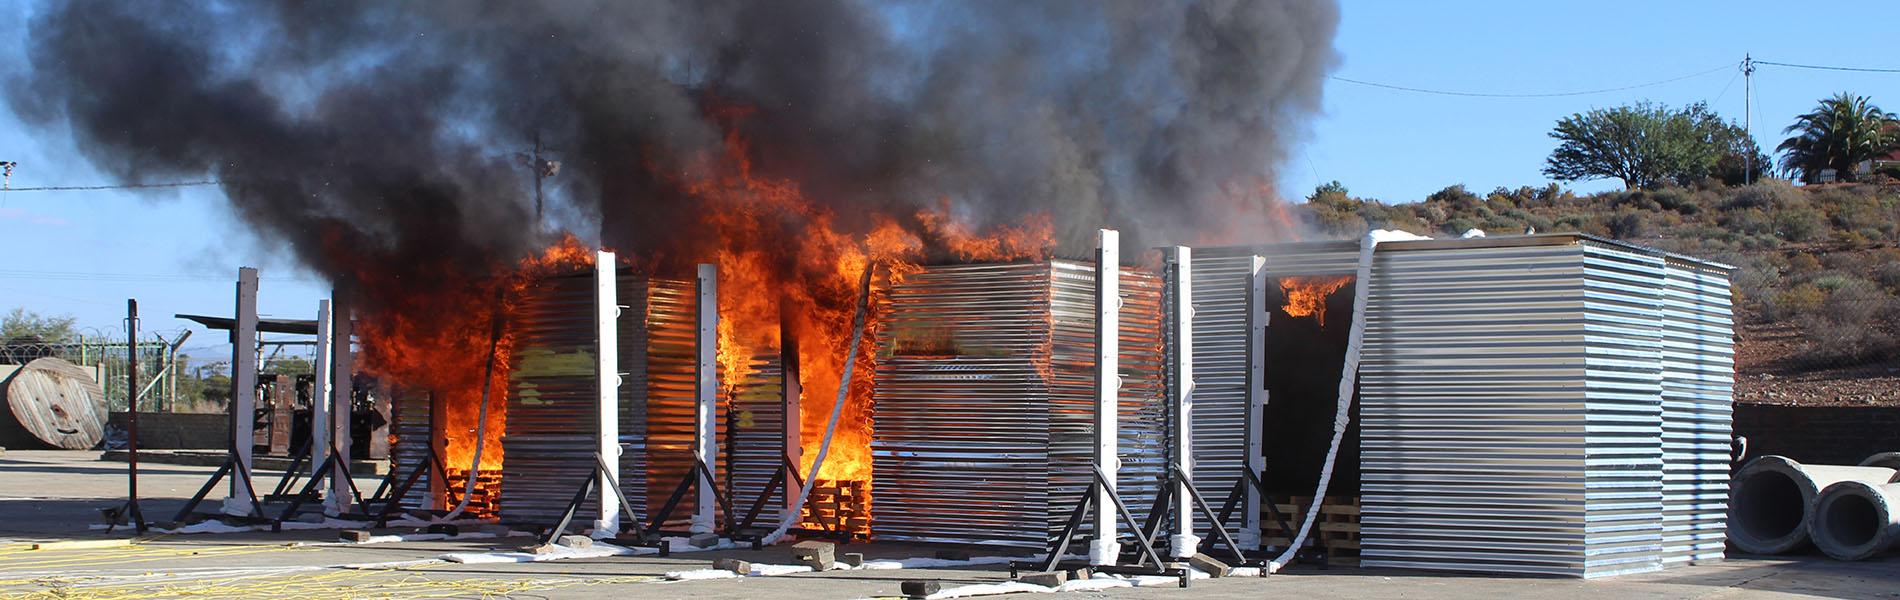 FireSUN Cicione foto websize